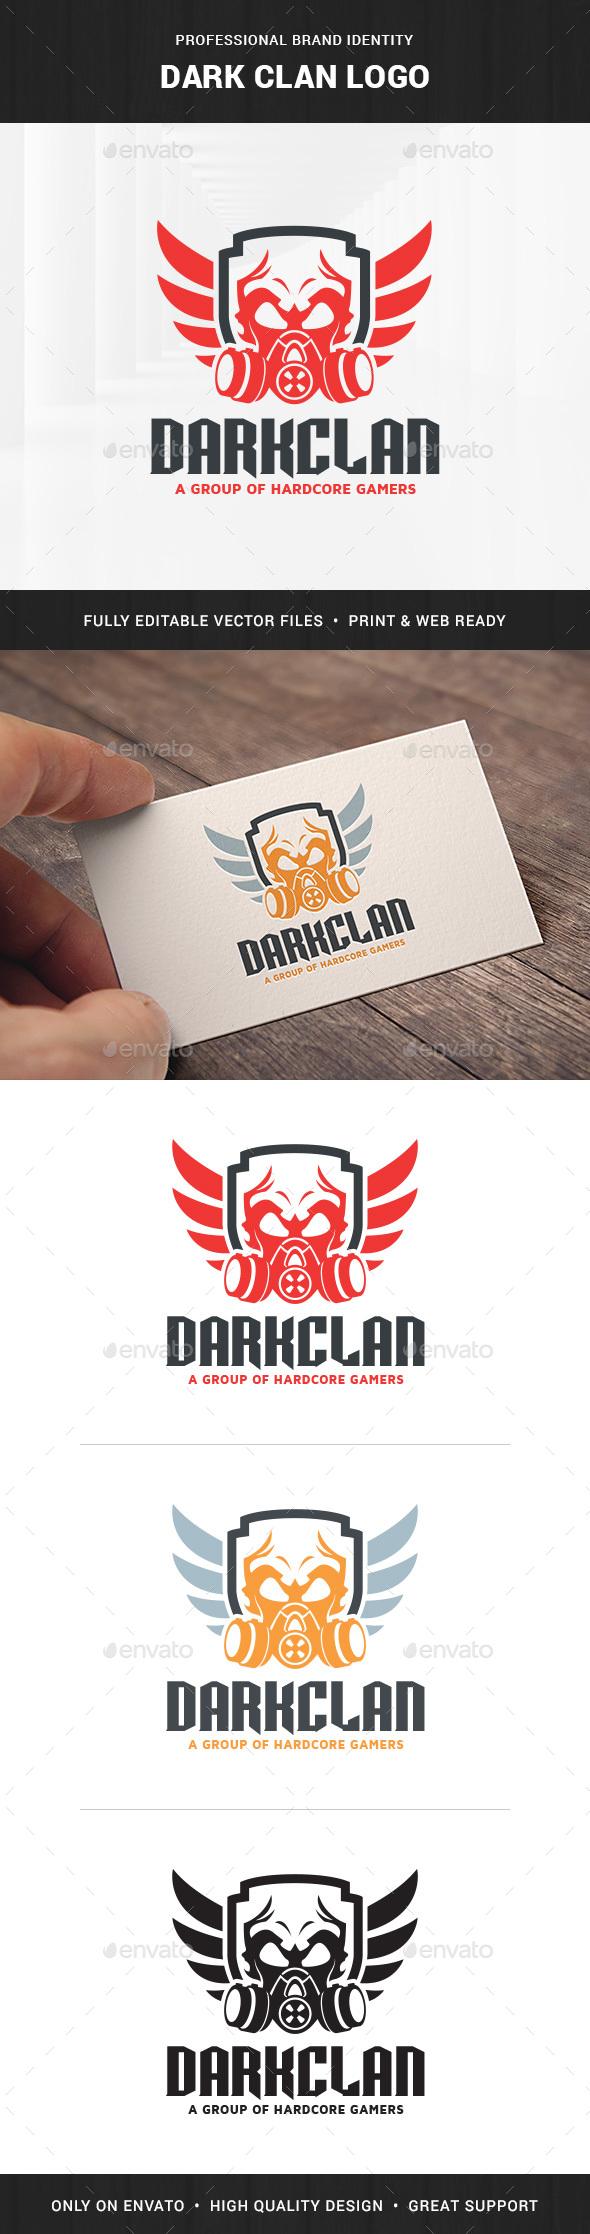 Dark Clan Logo Template - Objects Logo Templates